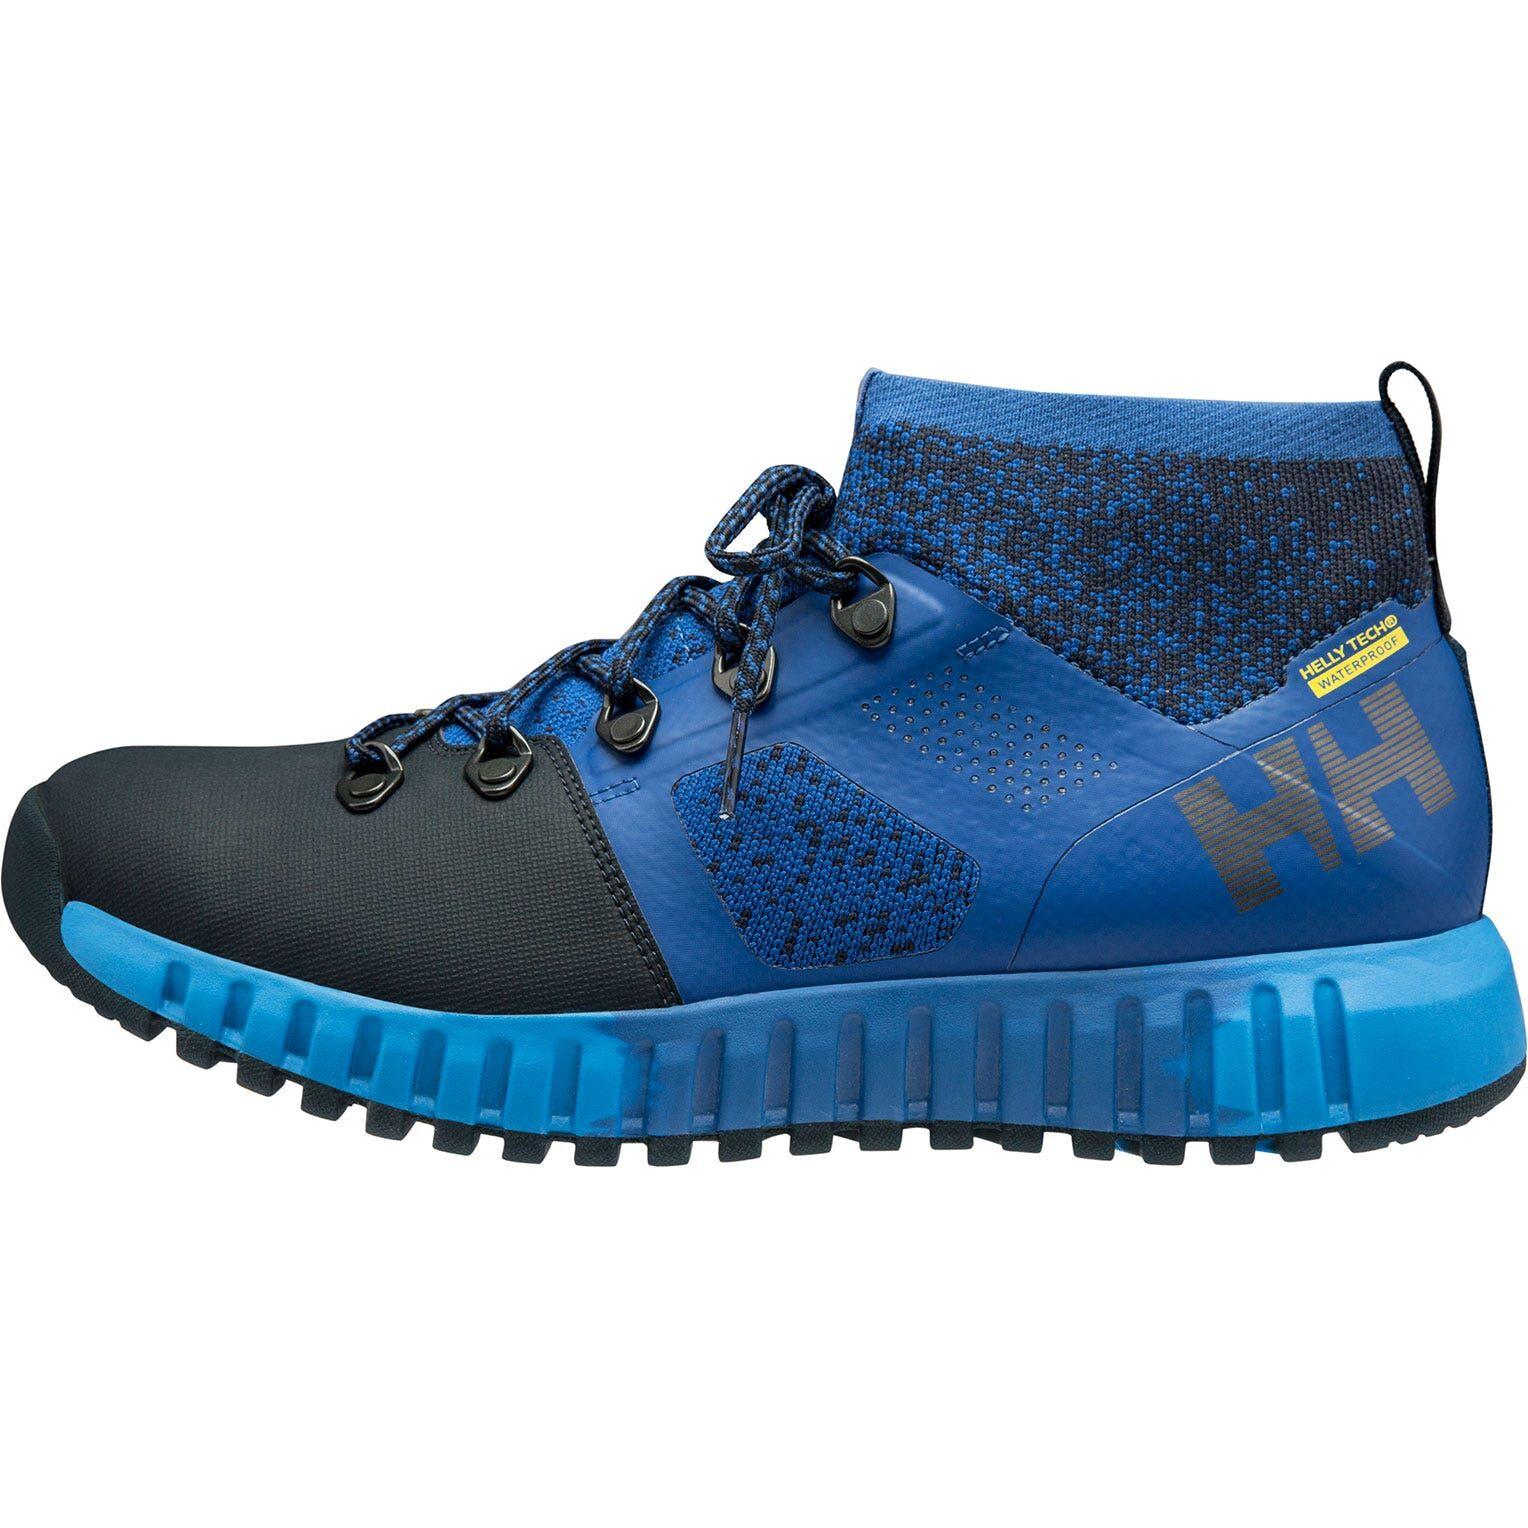 Helly Hansen Vanir Canter Ht Mens Hiking Boot Navy 44.5/10.5